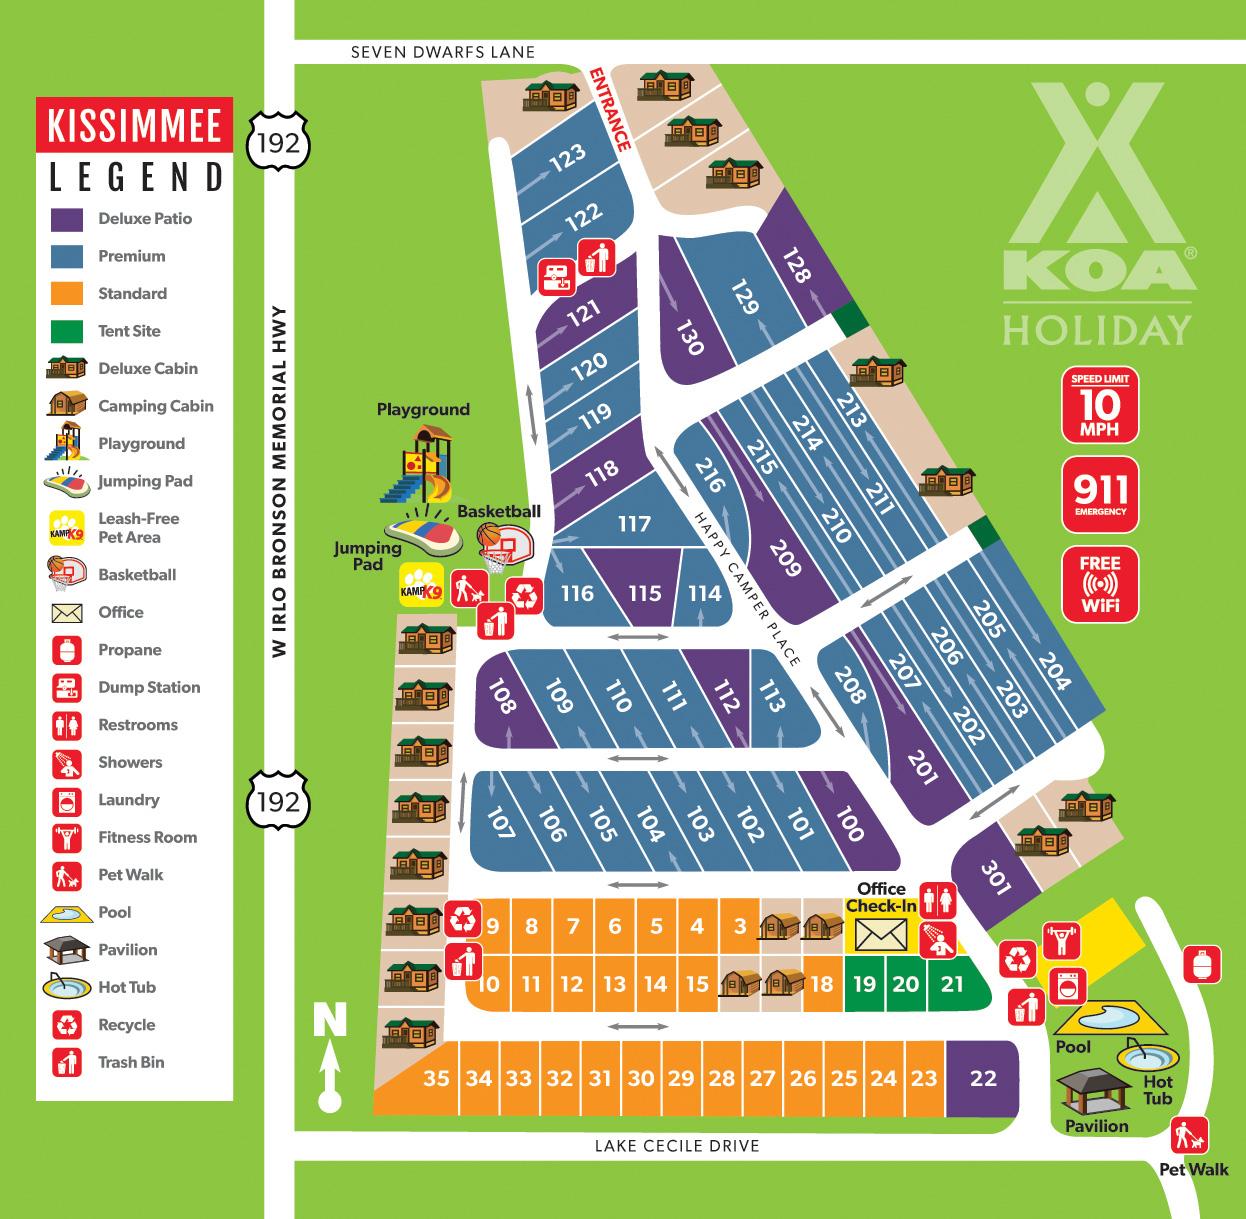 Kissimmee, Florida Campground | Orlando / Kissimmee Koa - Map Of Koa Campgrounds In Florida